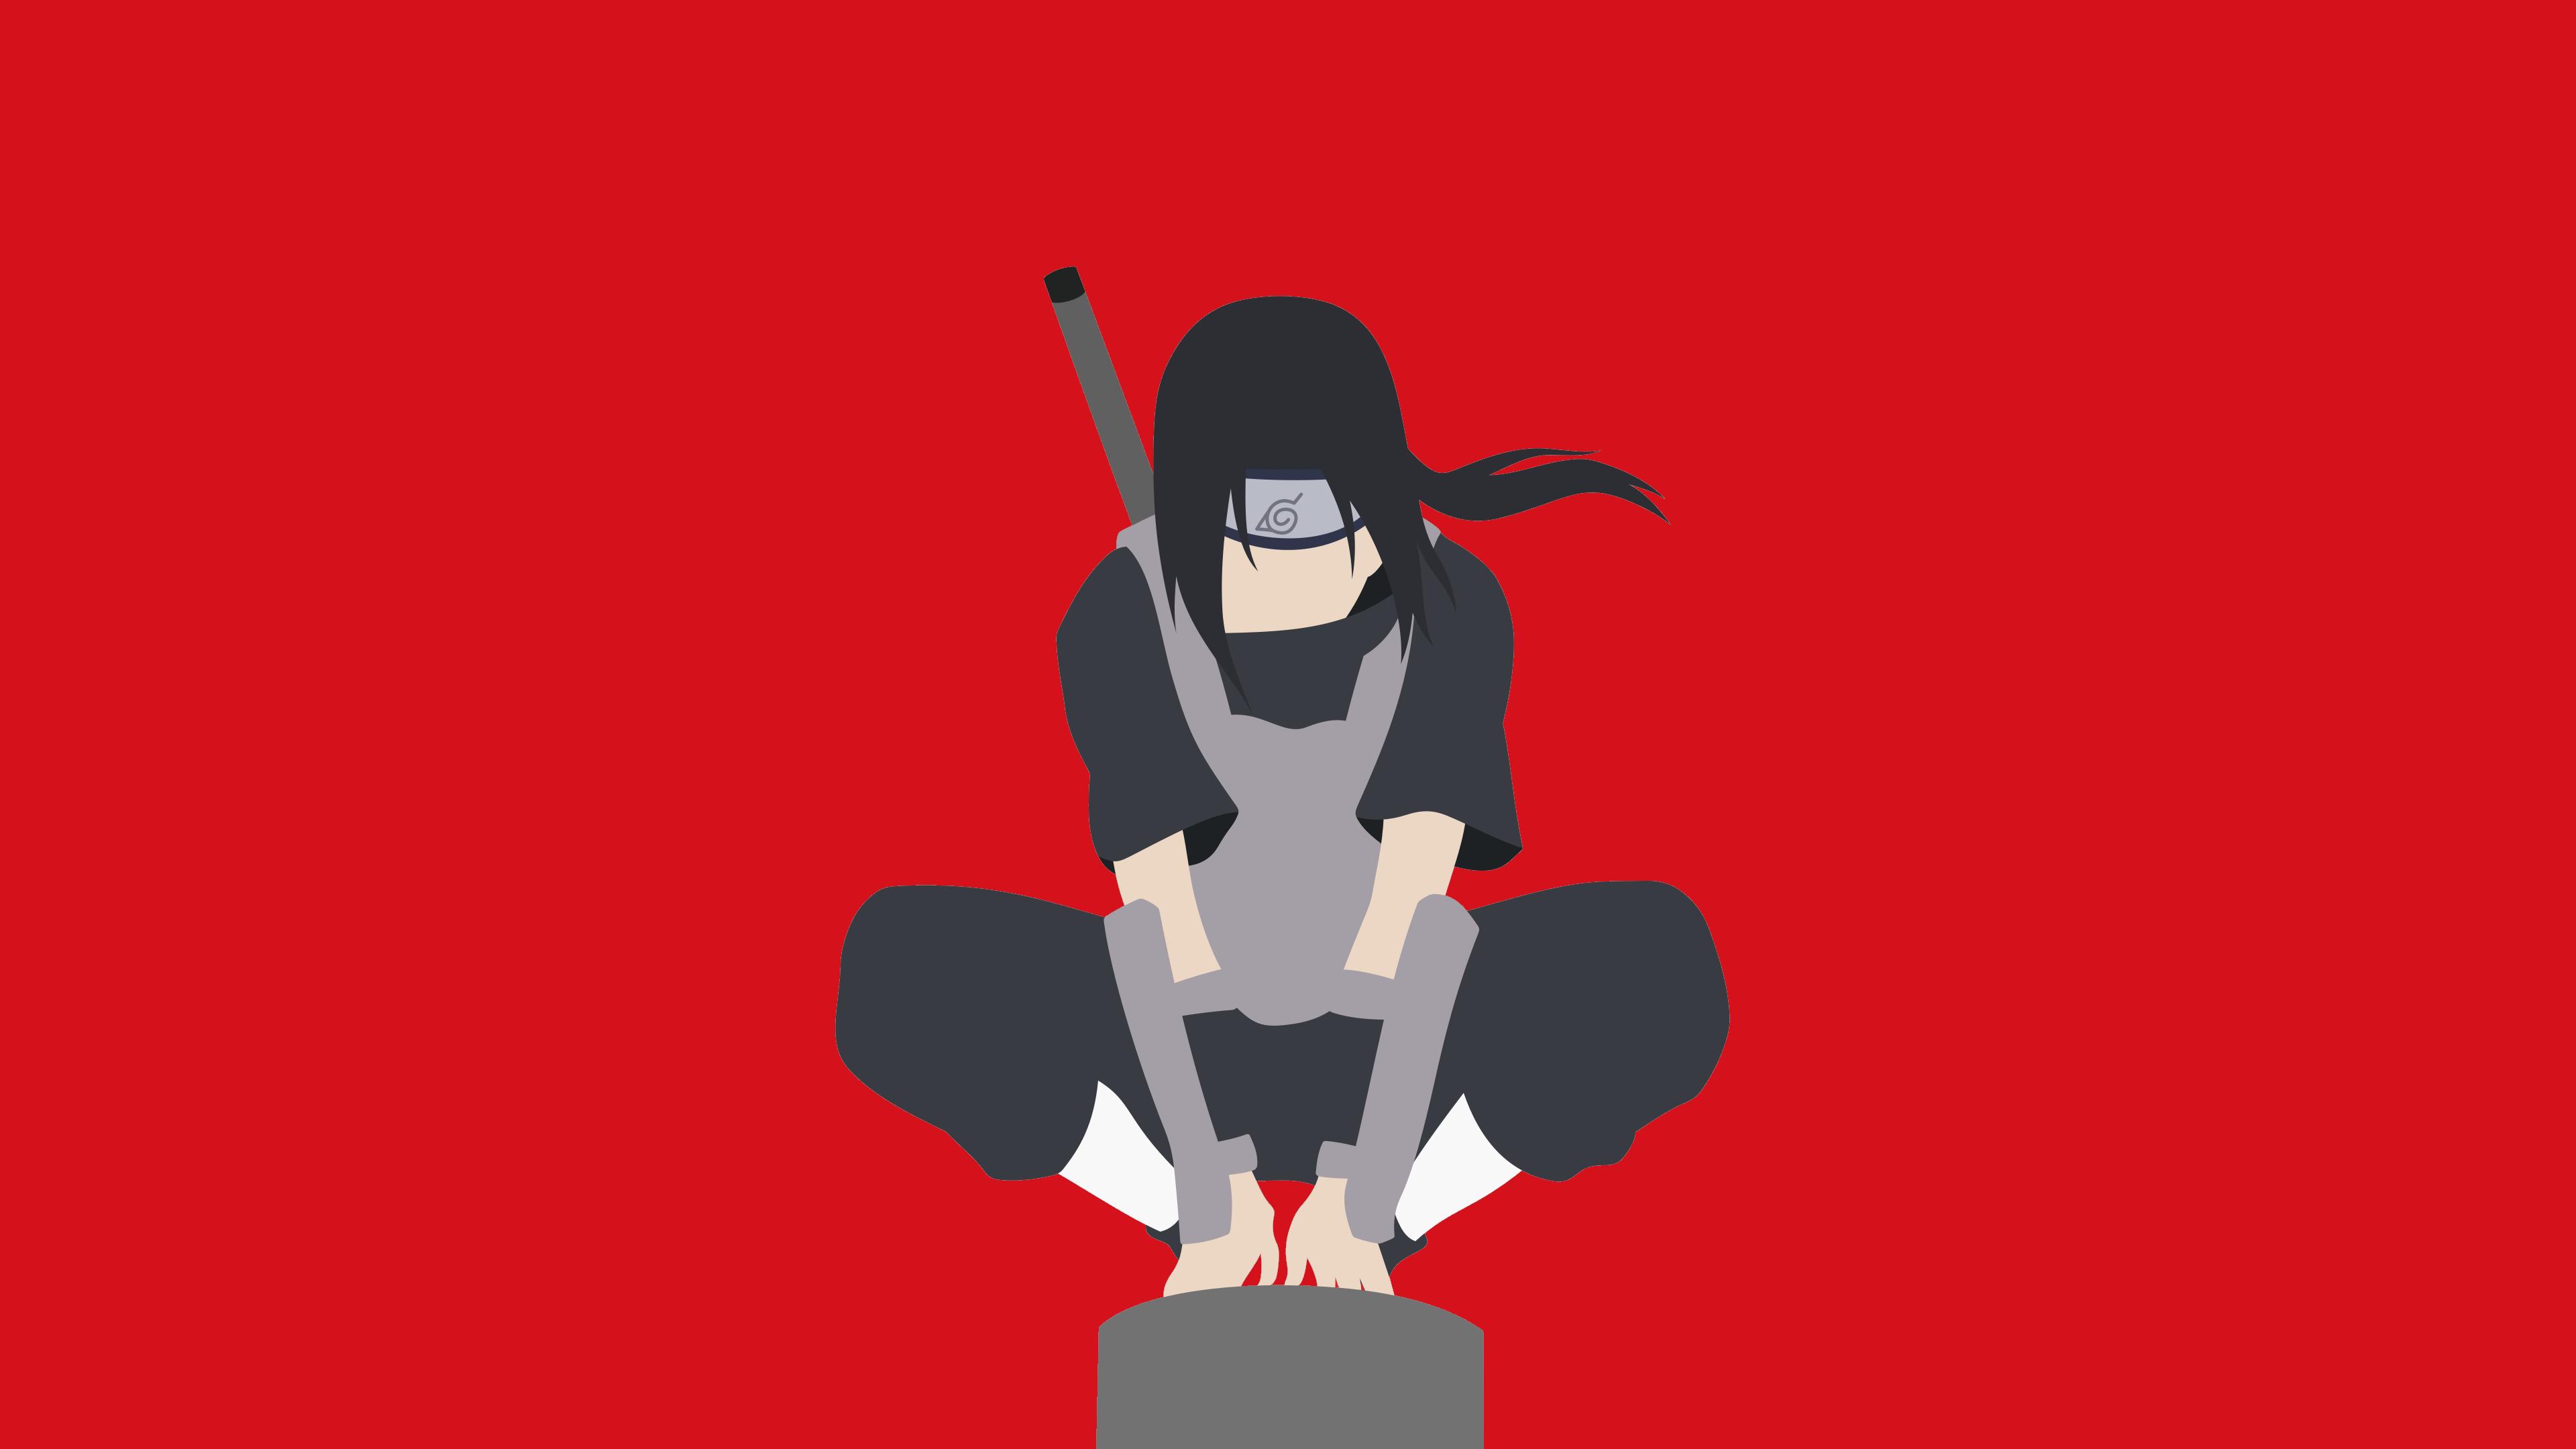 Hintergrundbilder Anime Naruto Shippuuden Minimalismus